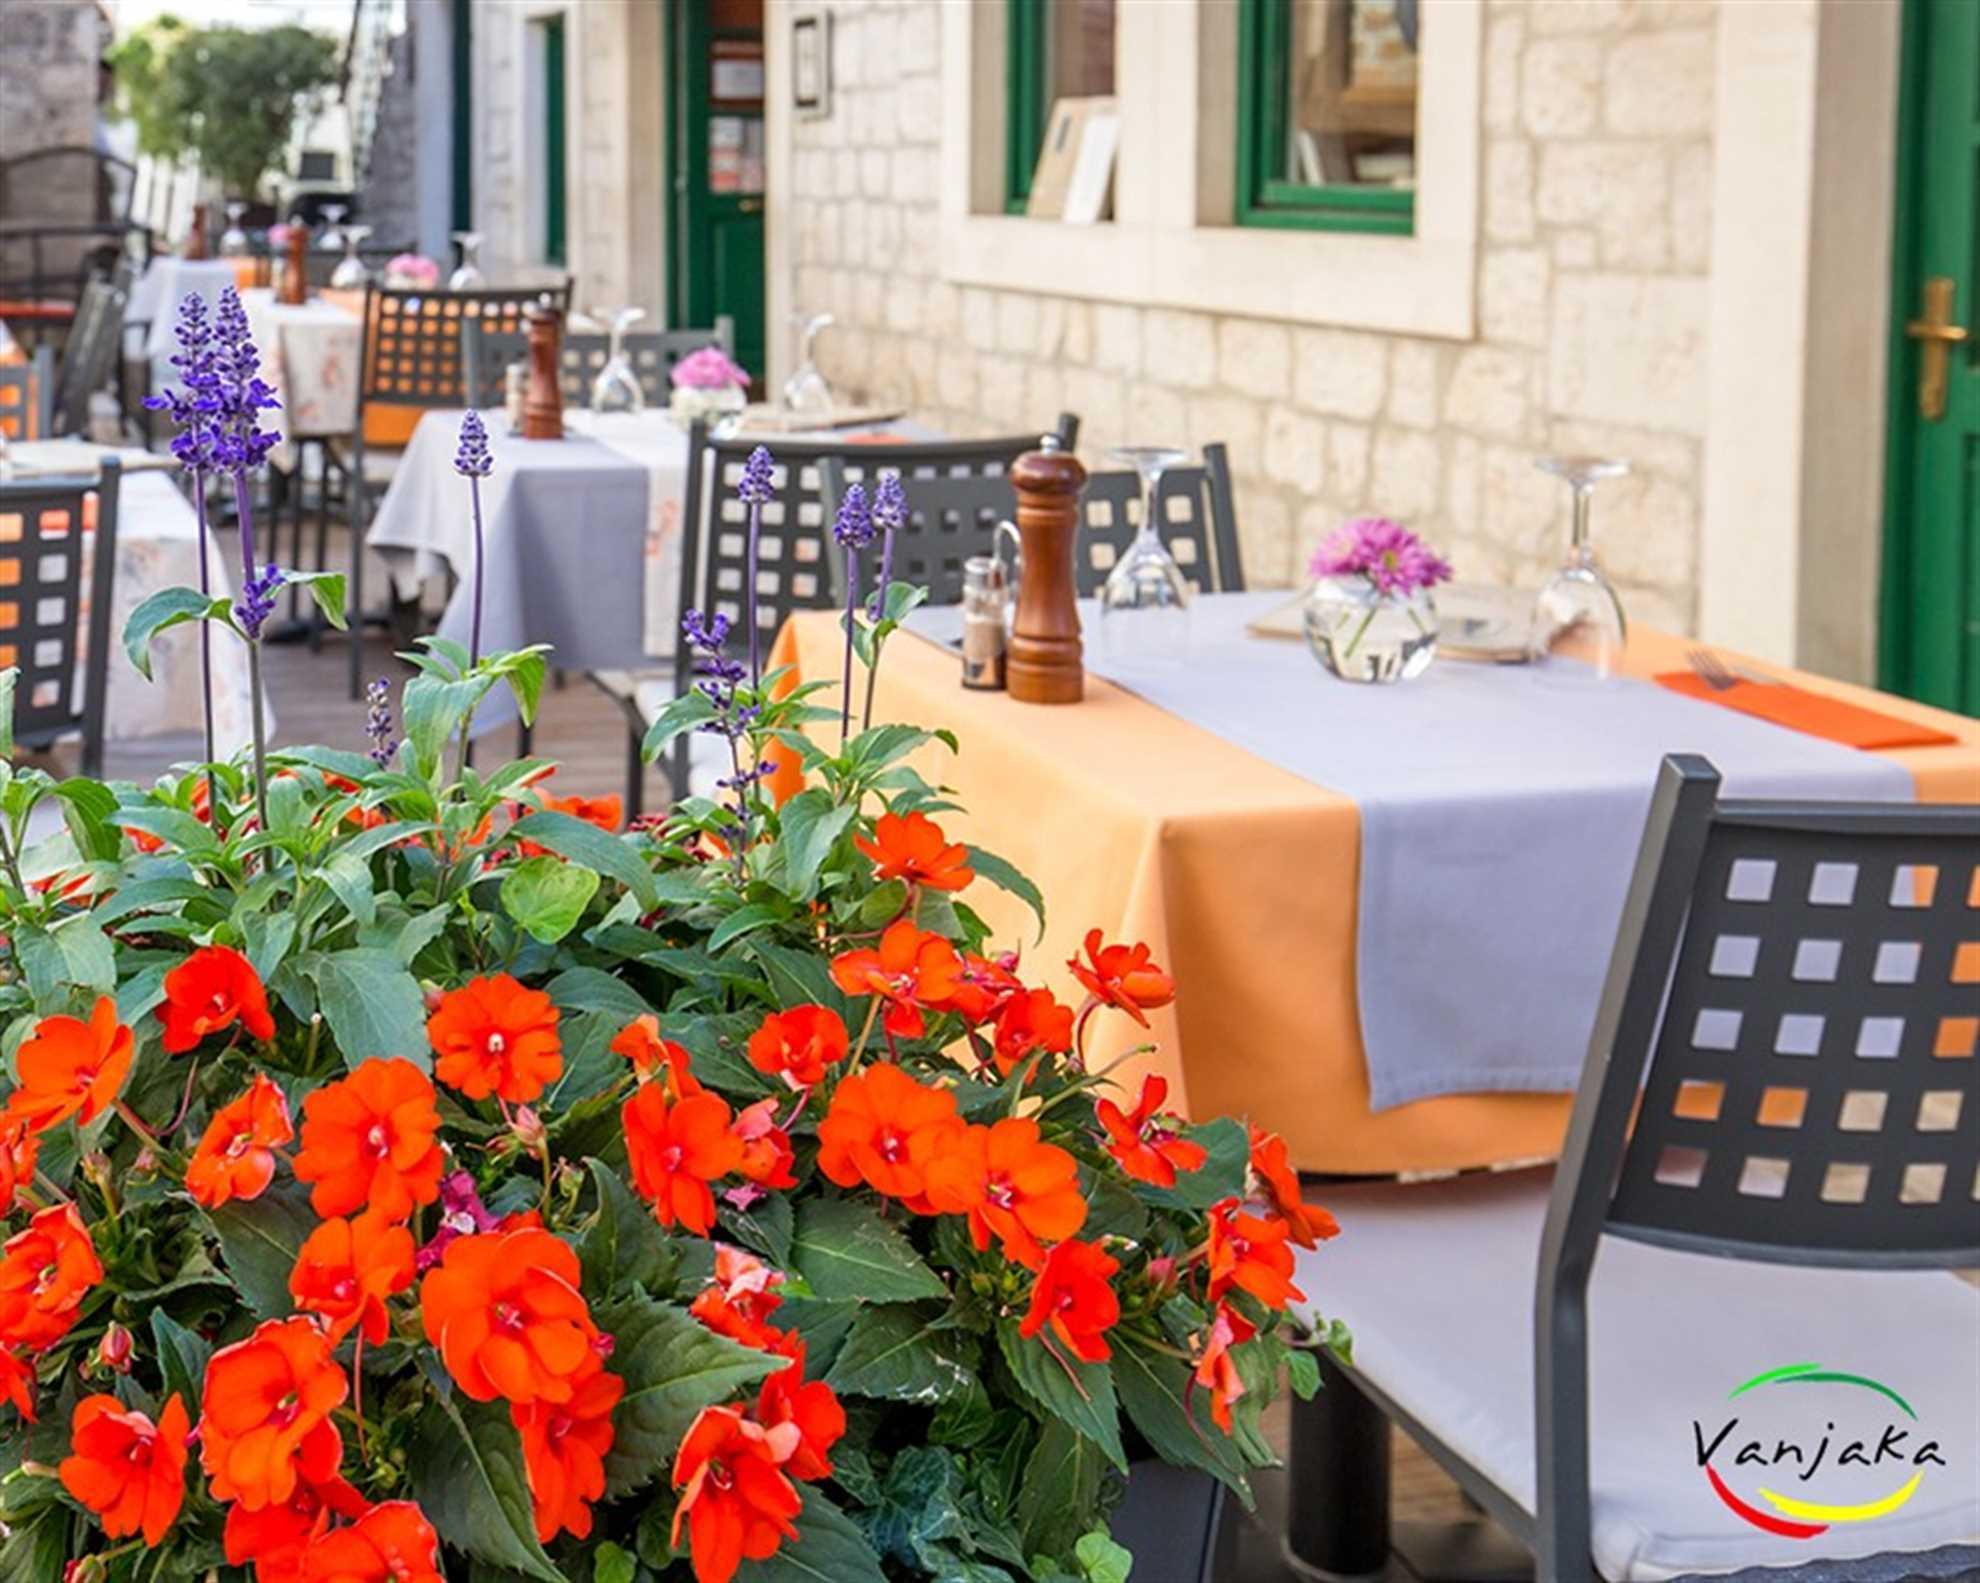 Restaurant Vanjaka in Trogir